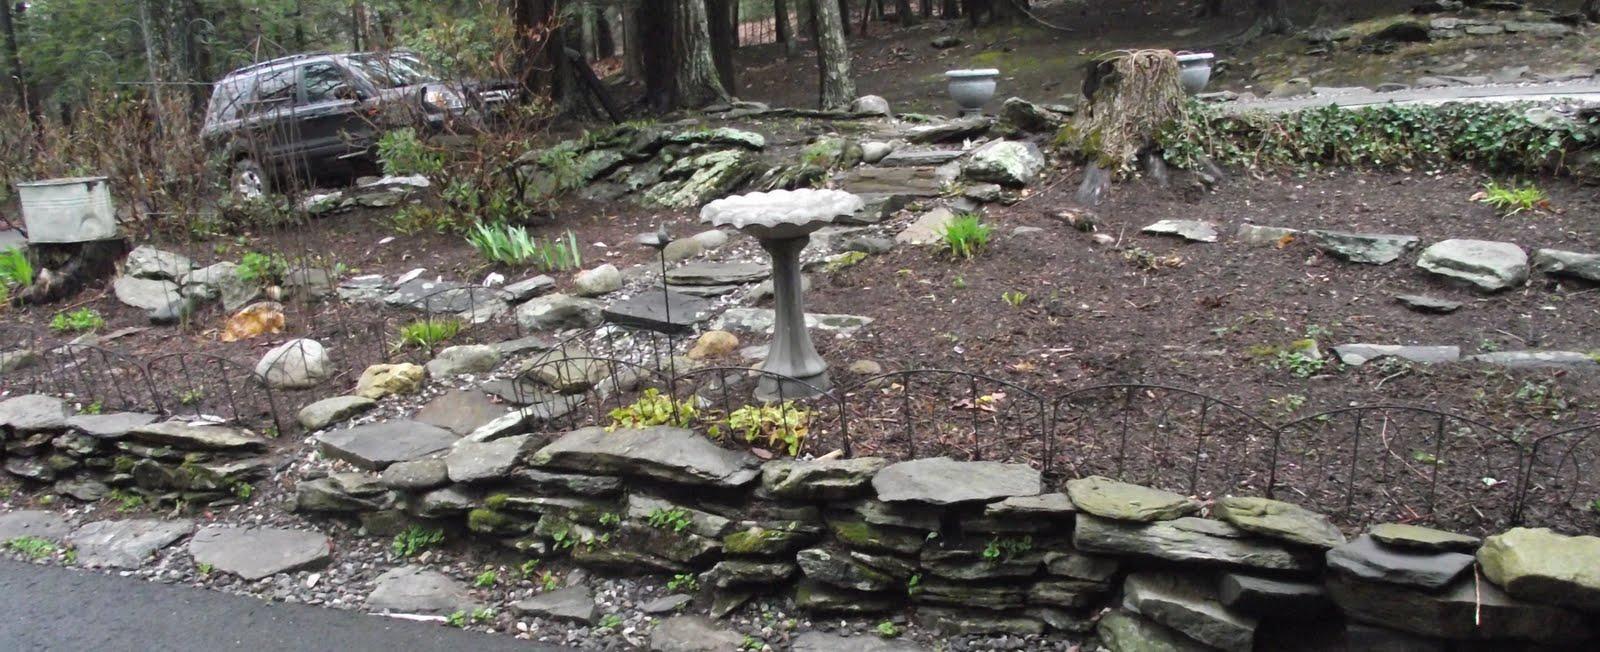 my faery garden*: messy garden goodness